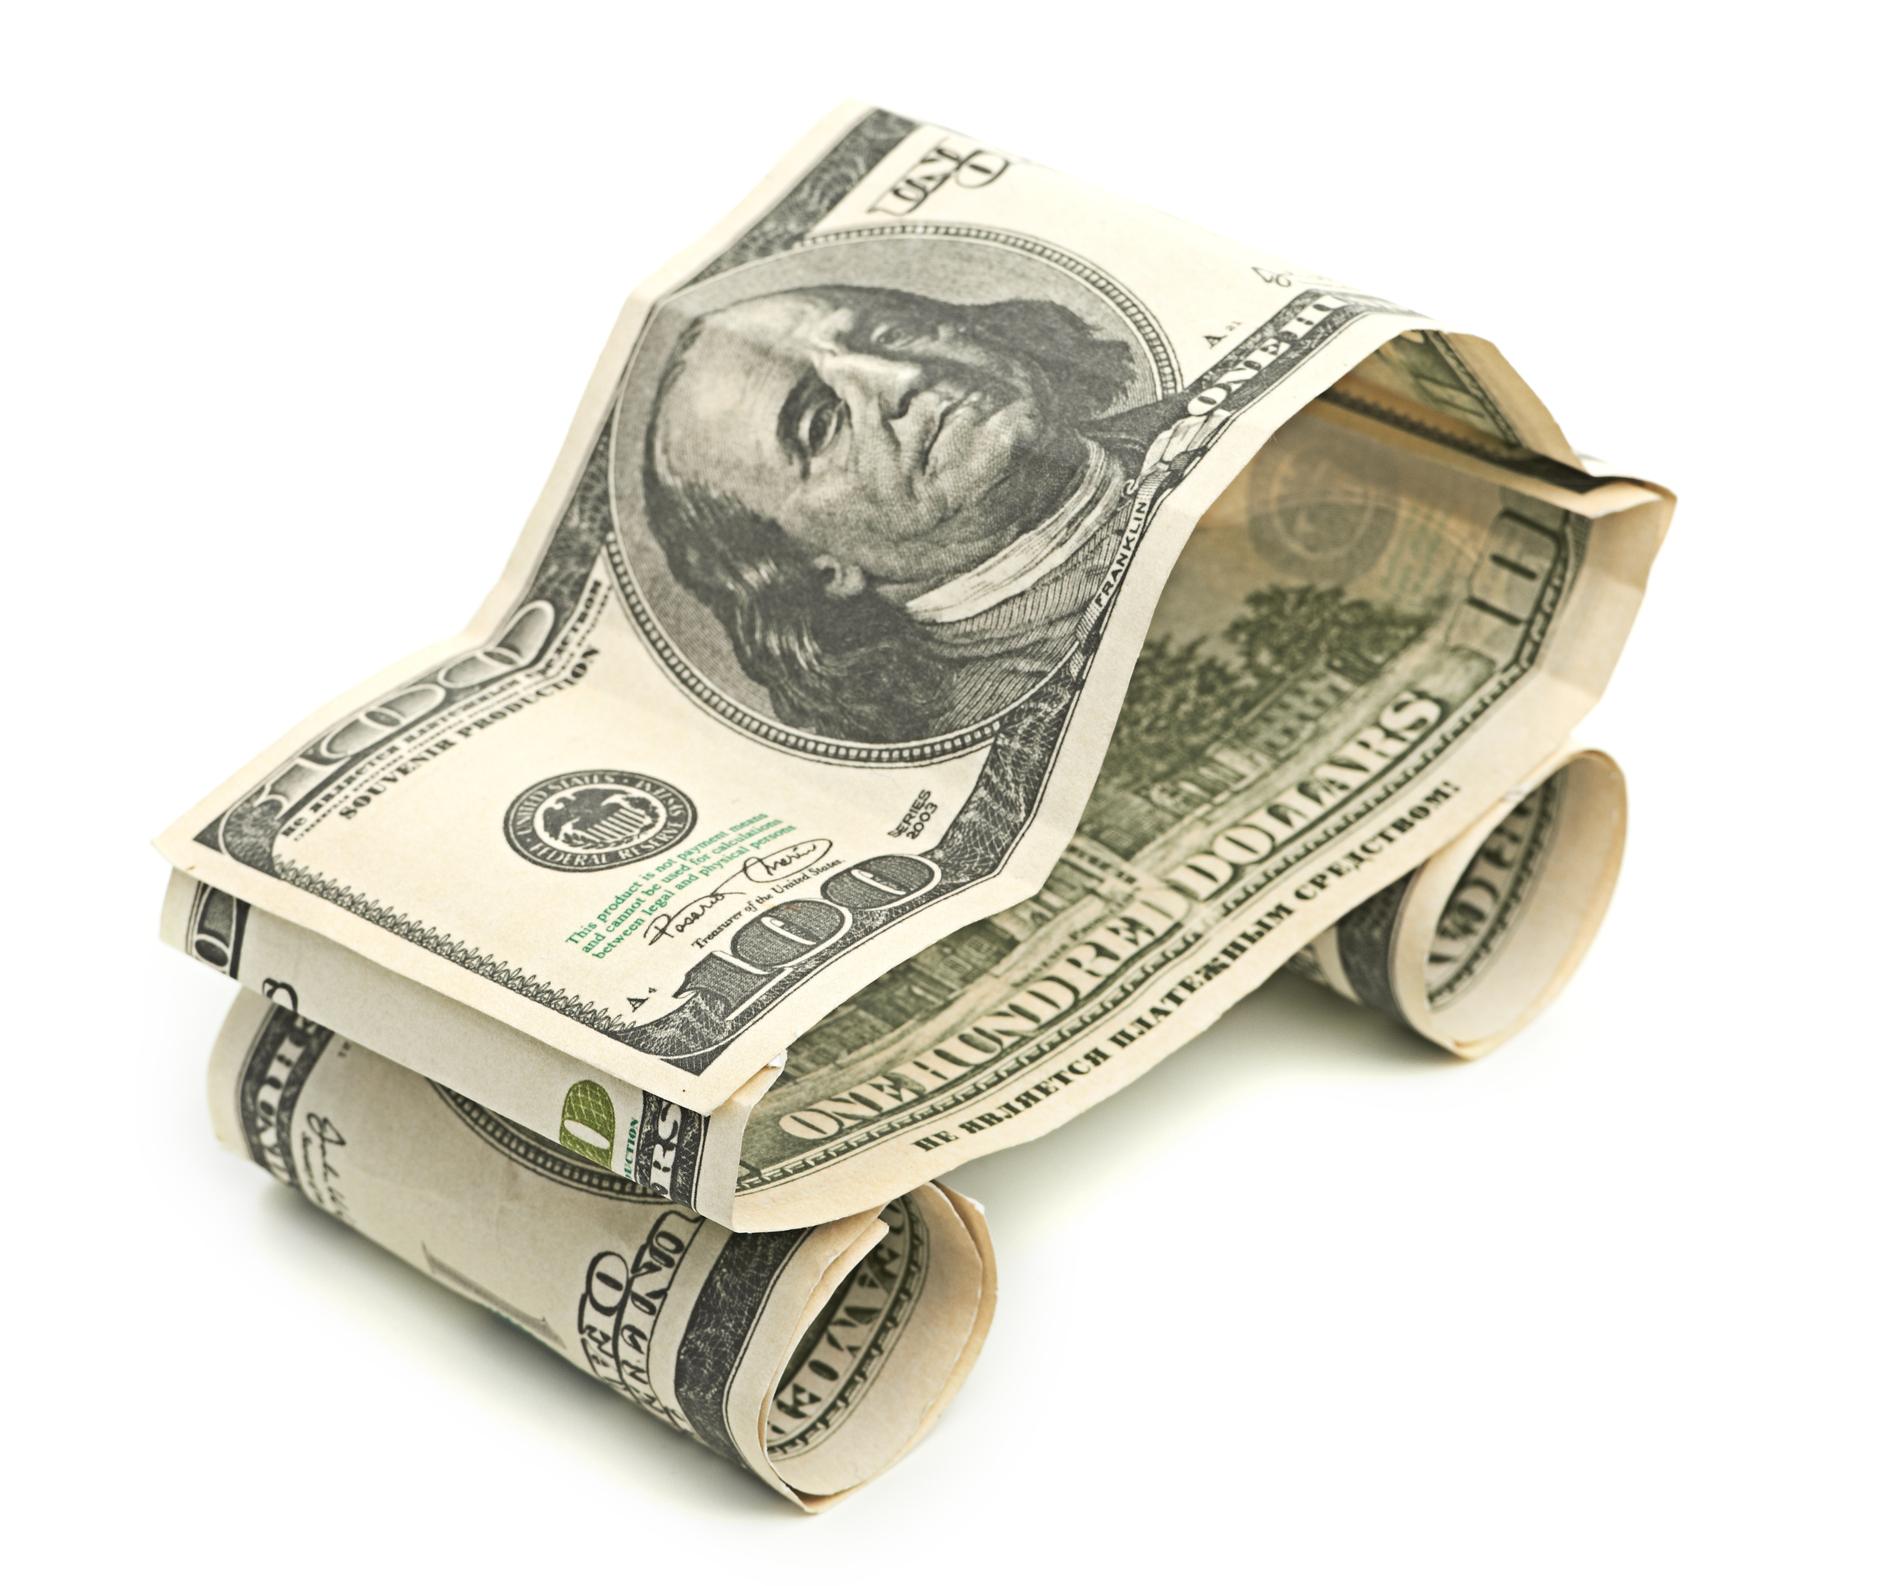 Three hundred-dollar bills folded into a simple car.